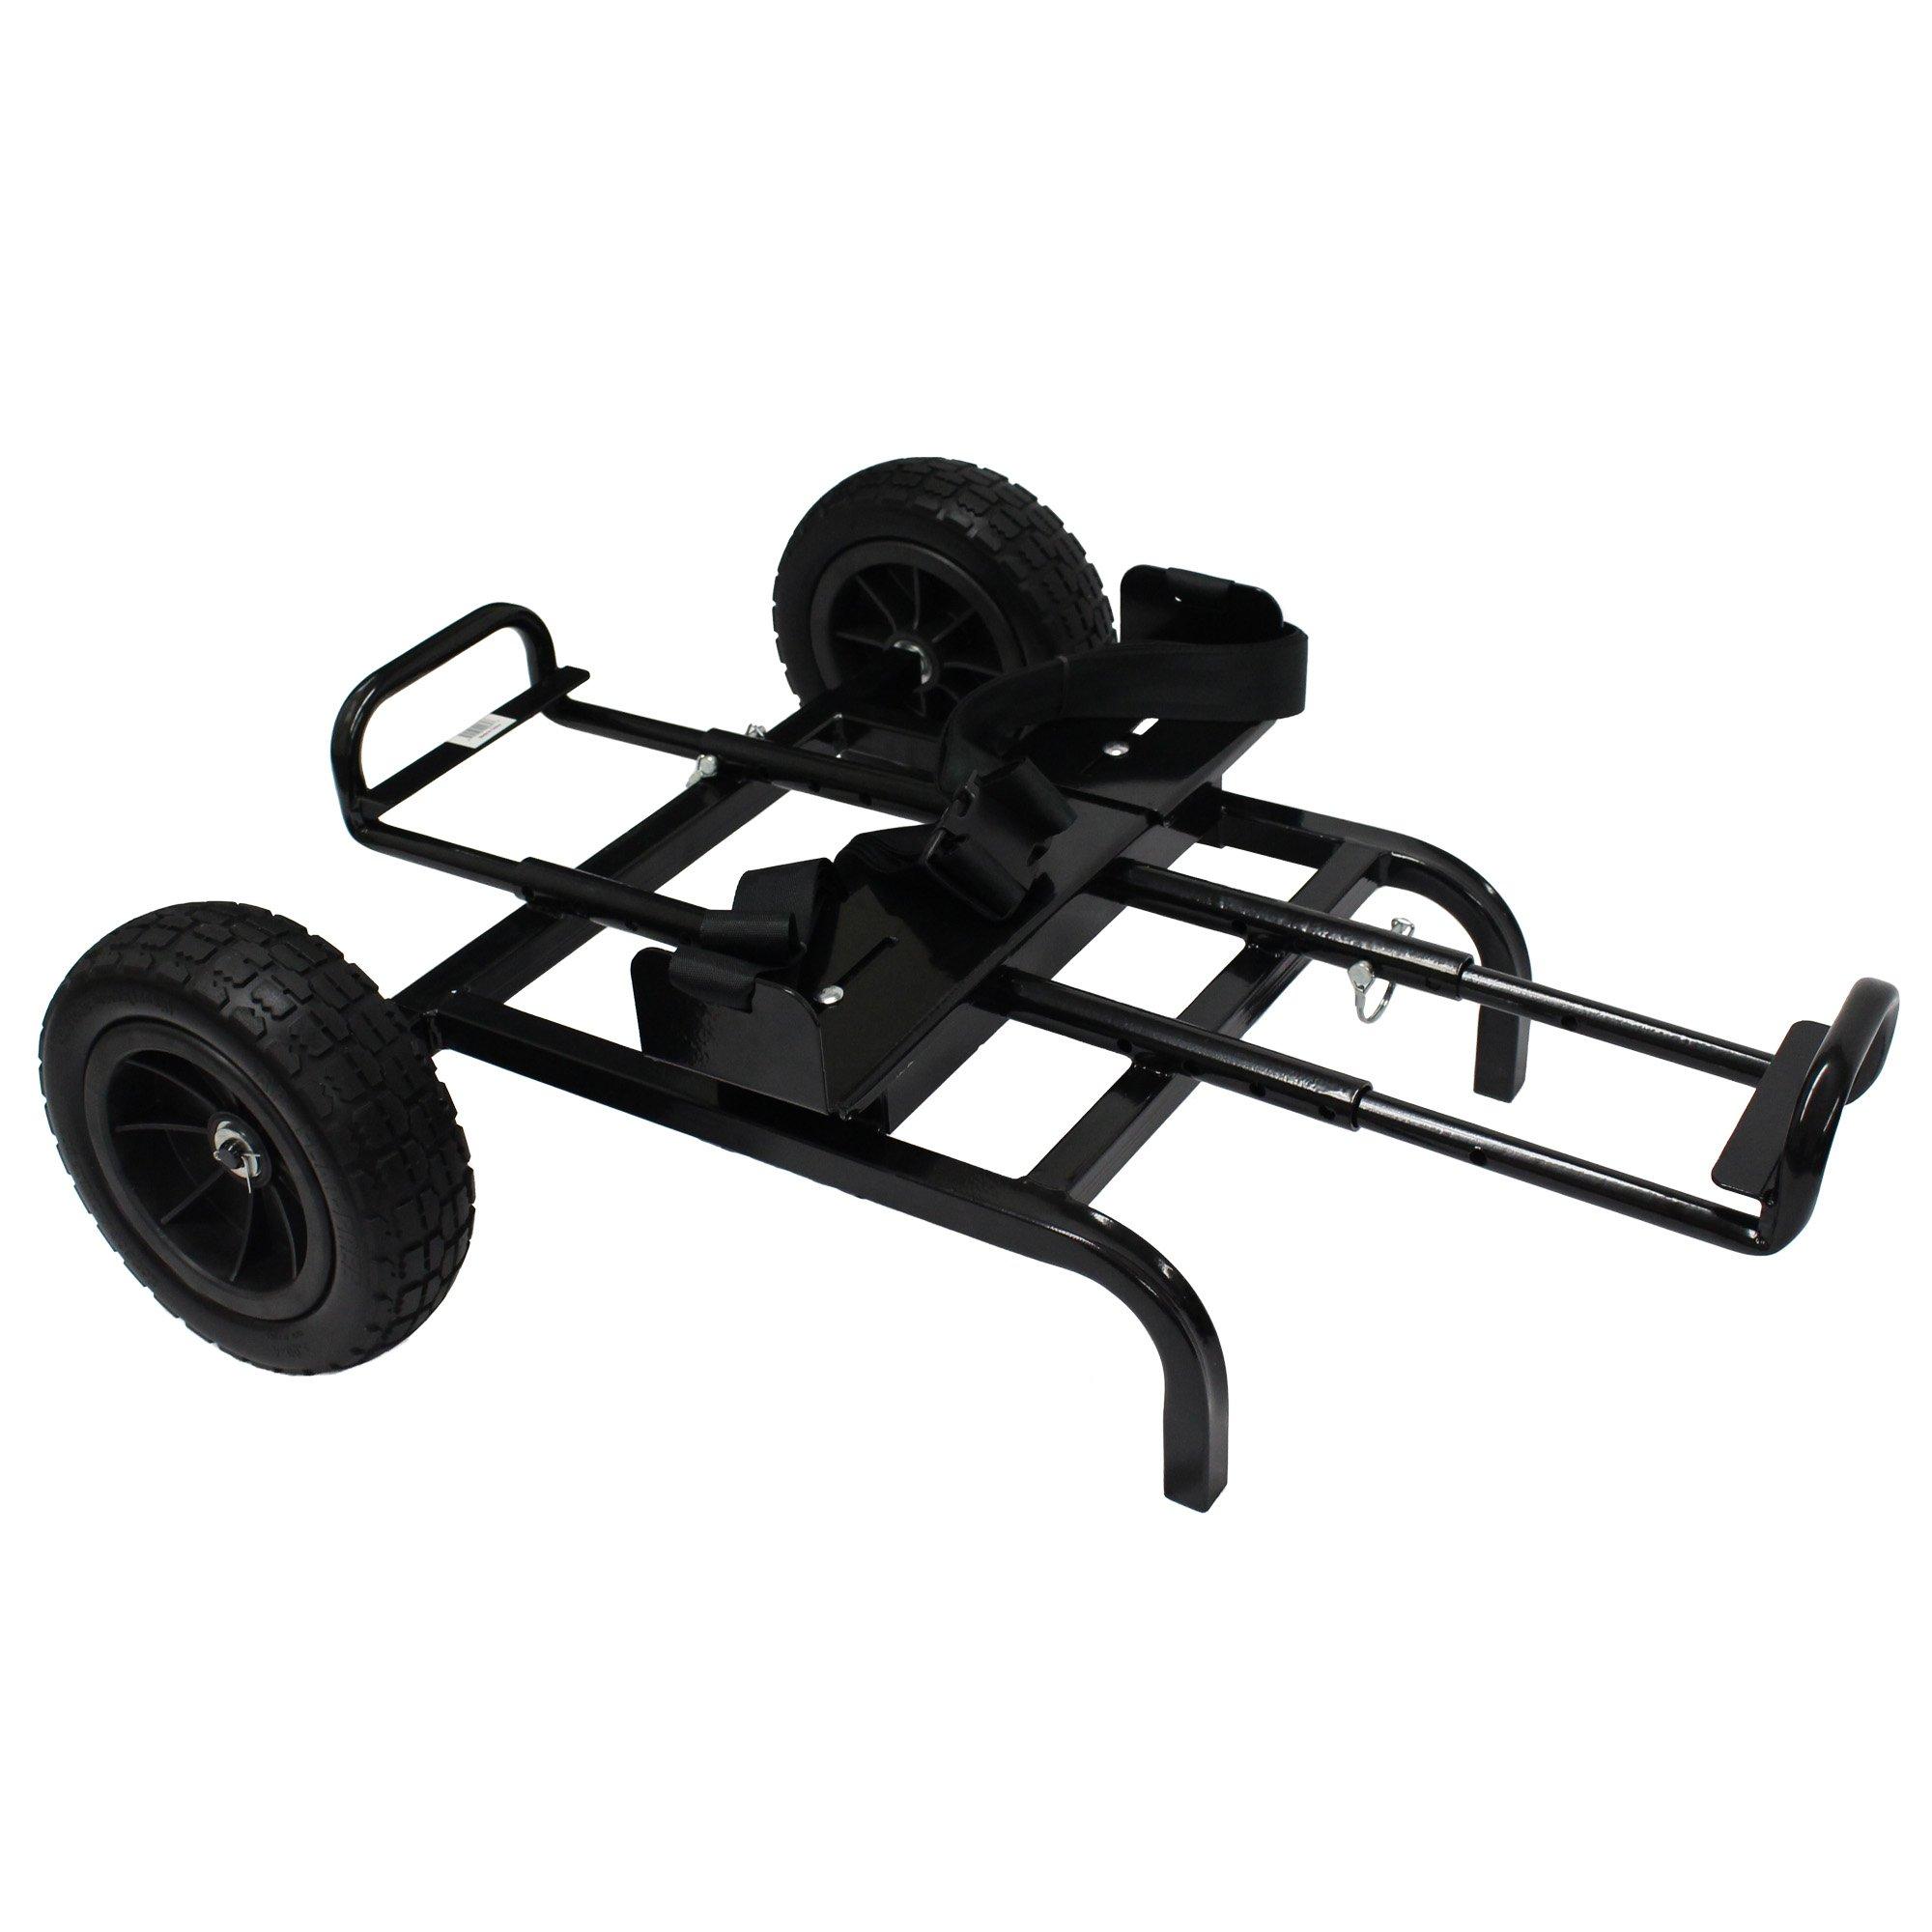 Garden Star 70135 Universal Fit Cooler Cart, Black by Garden Star (Image #3)